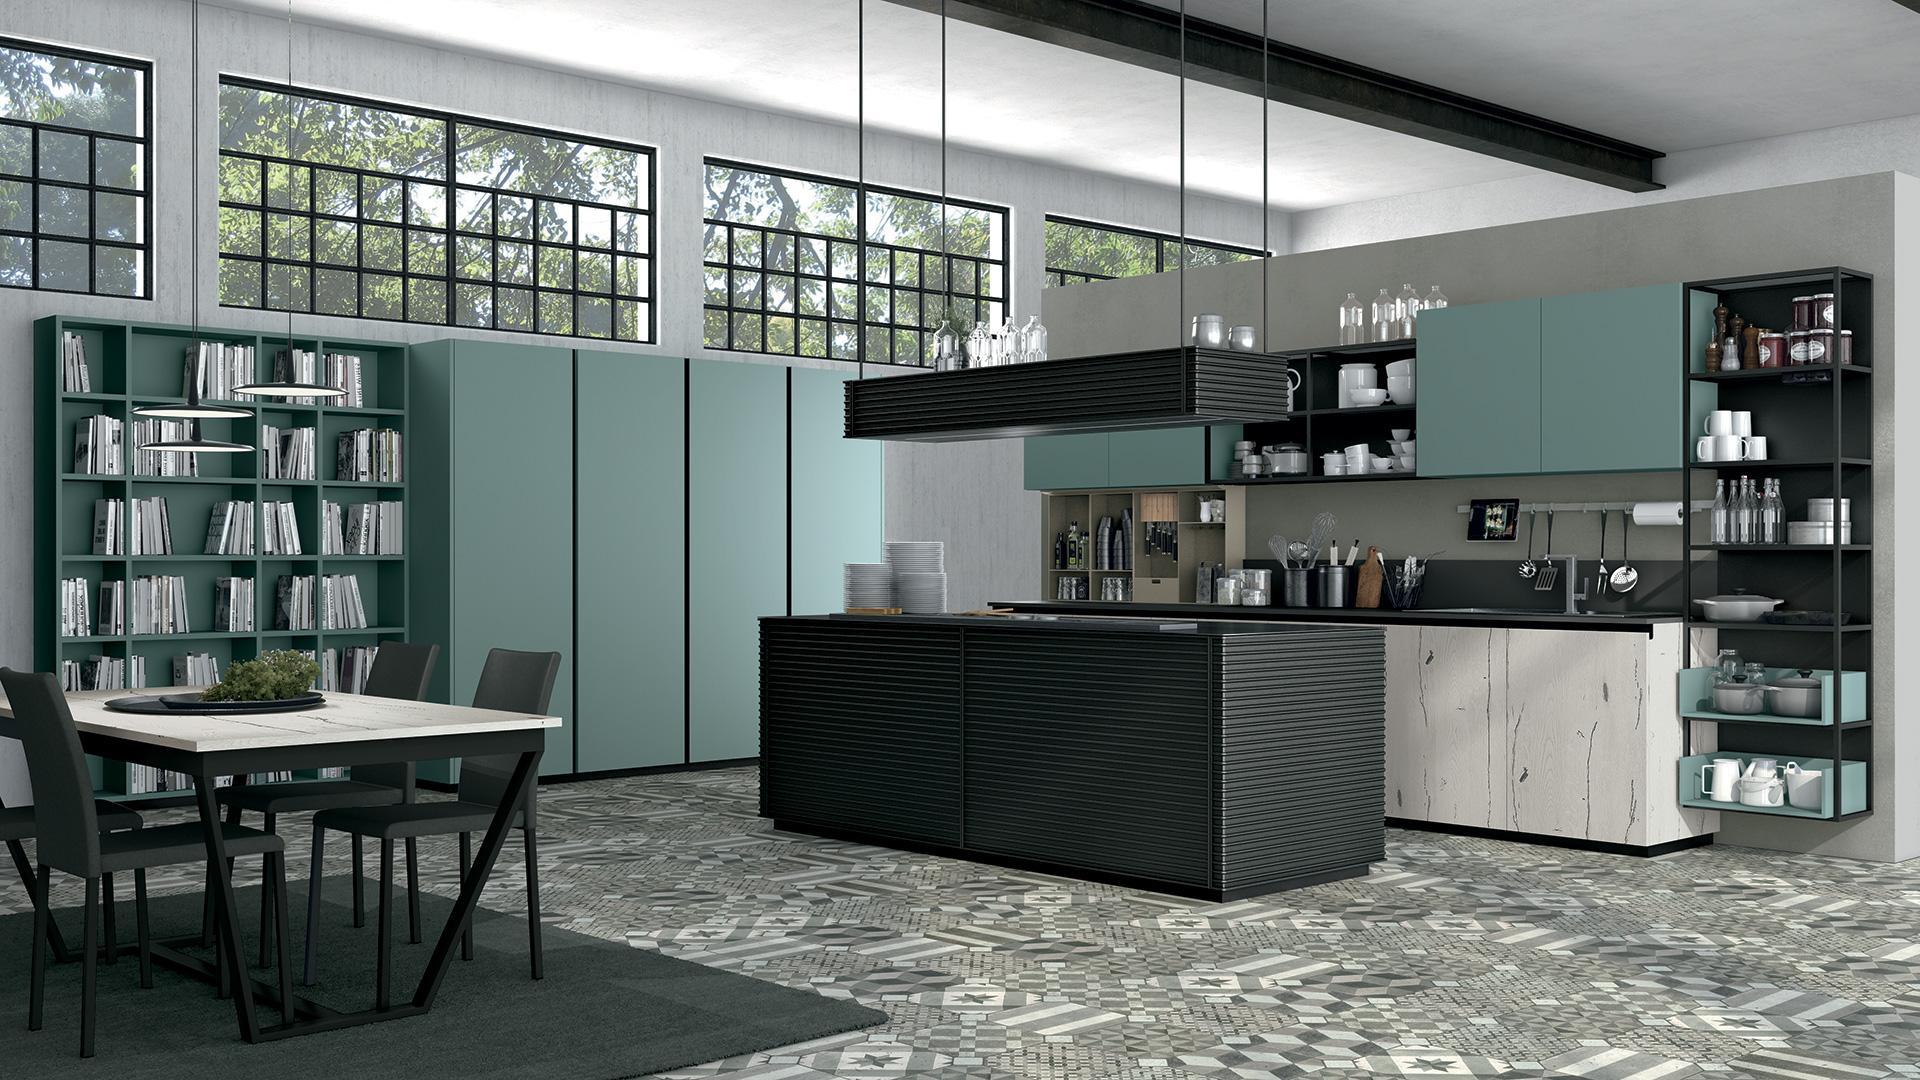 Cucine Lube Modell Oltre. Küche mit Insel aus Aluminiumfronten.